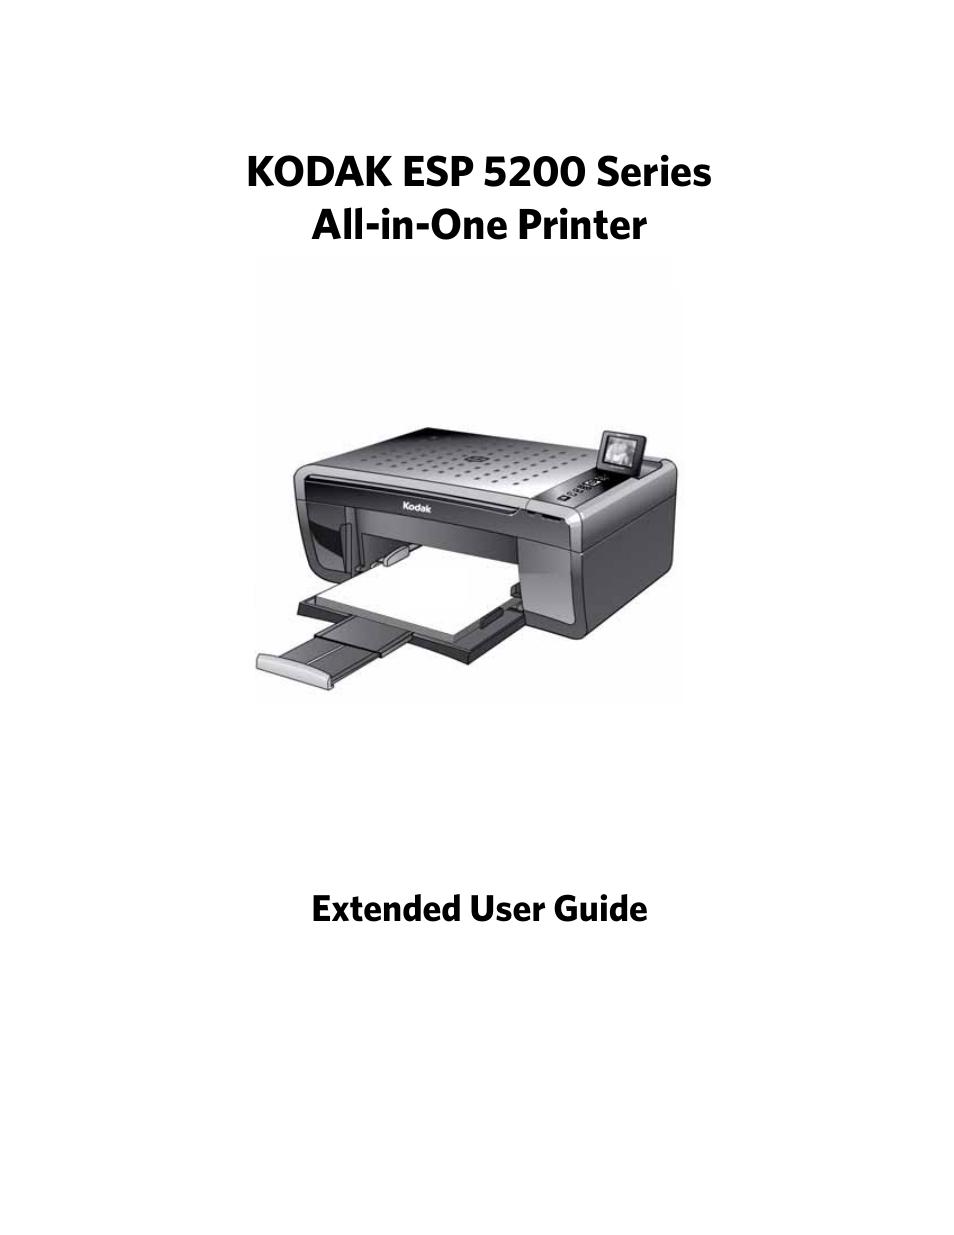 kodak esp 5200 user manual 73 pages also for esp 5210 esp 5250 rh manualsdir com Kodak Printers 5200 Series Kodak ESP 5200 Wireless